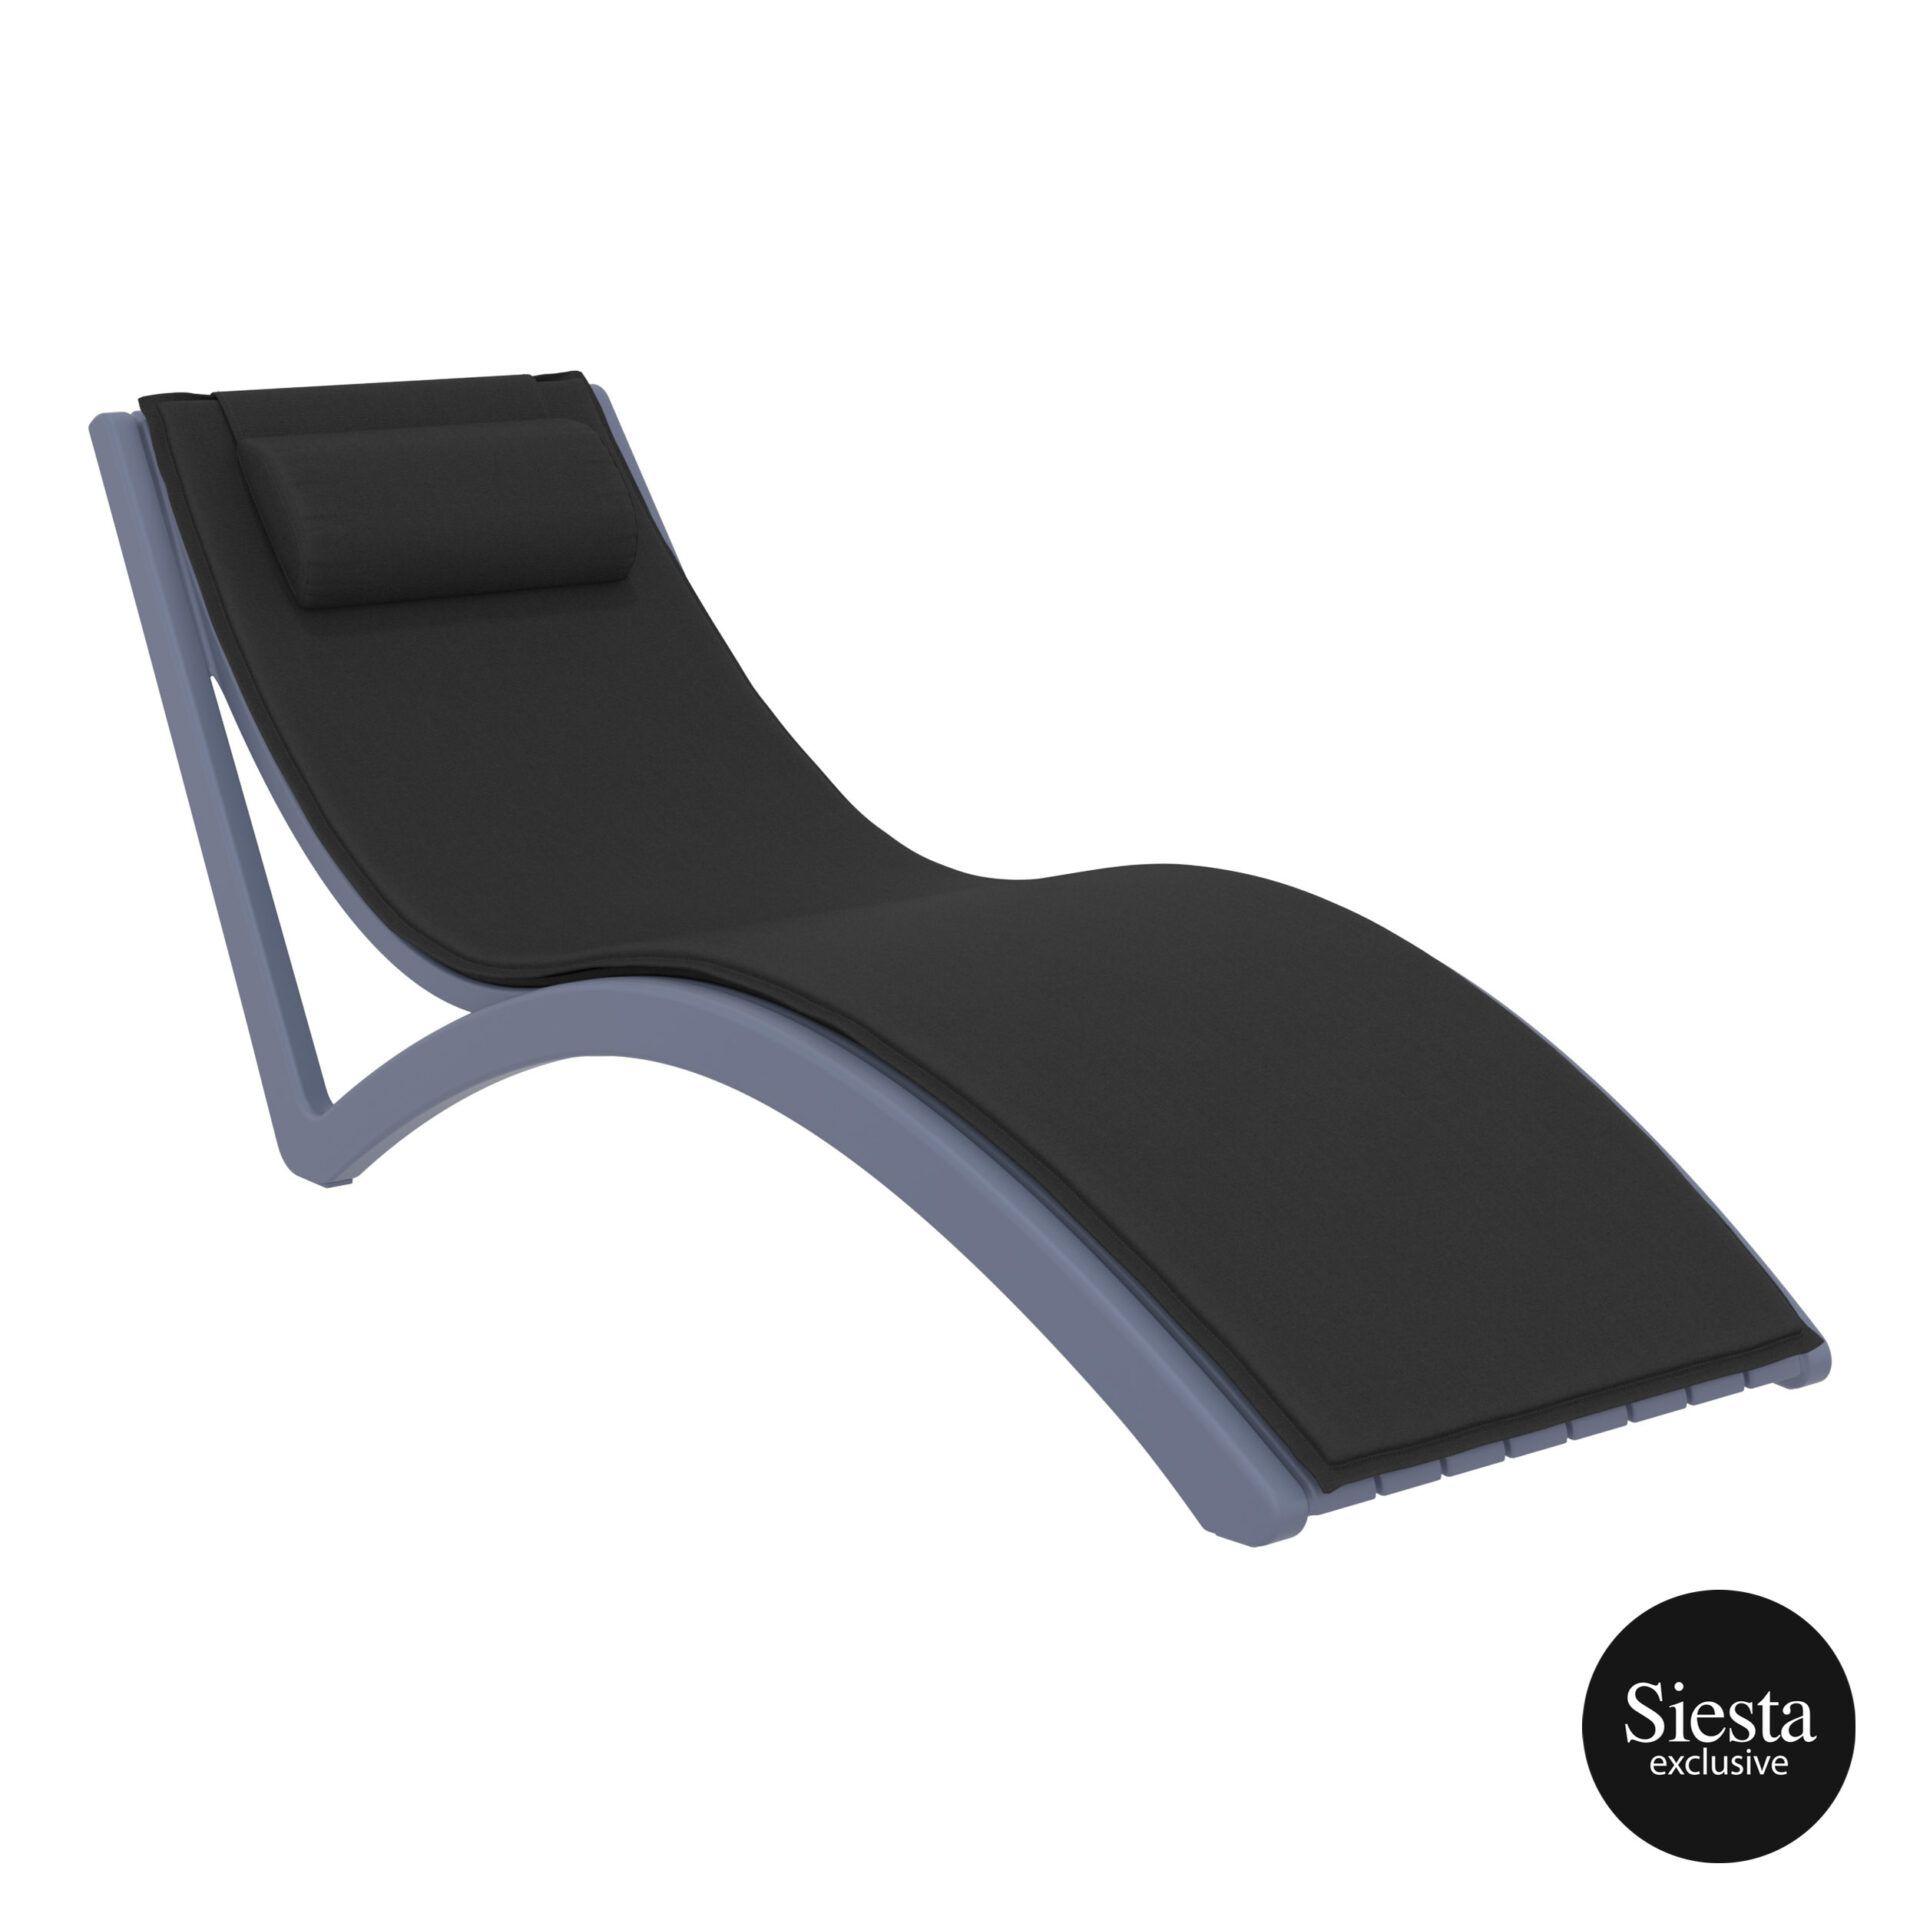 outdoor polypropylene slim sunlounger pillow cushion darkgrey black front side